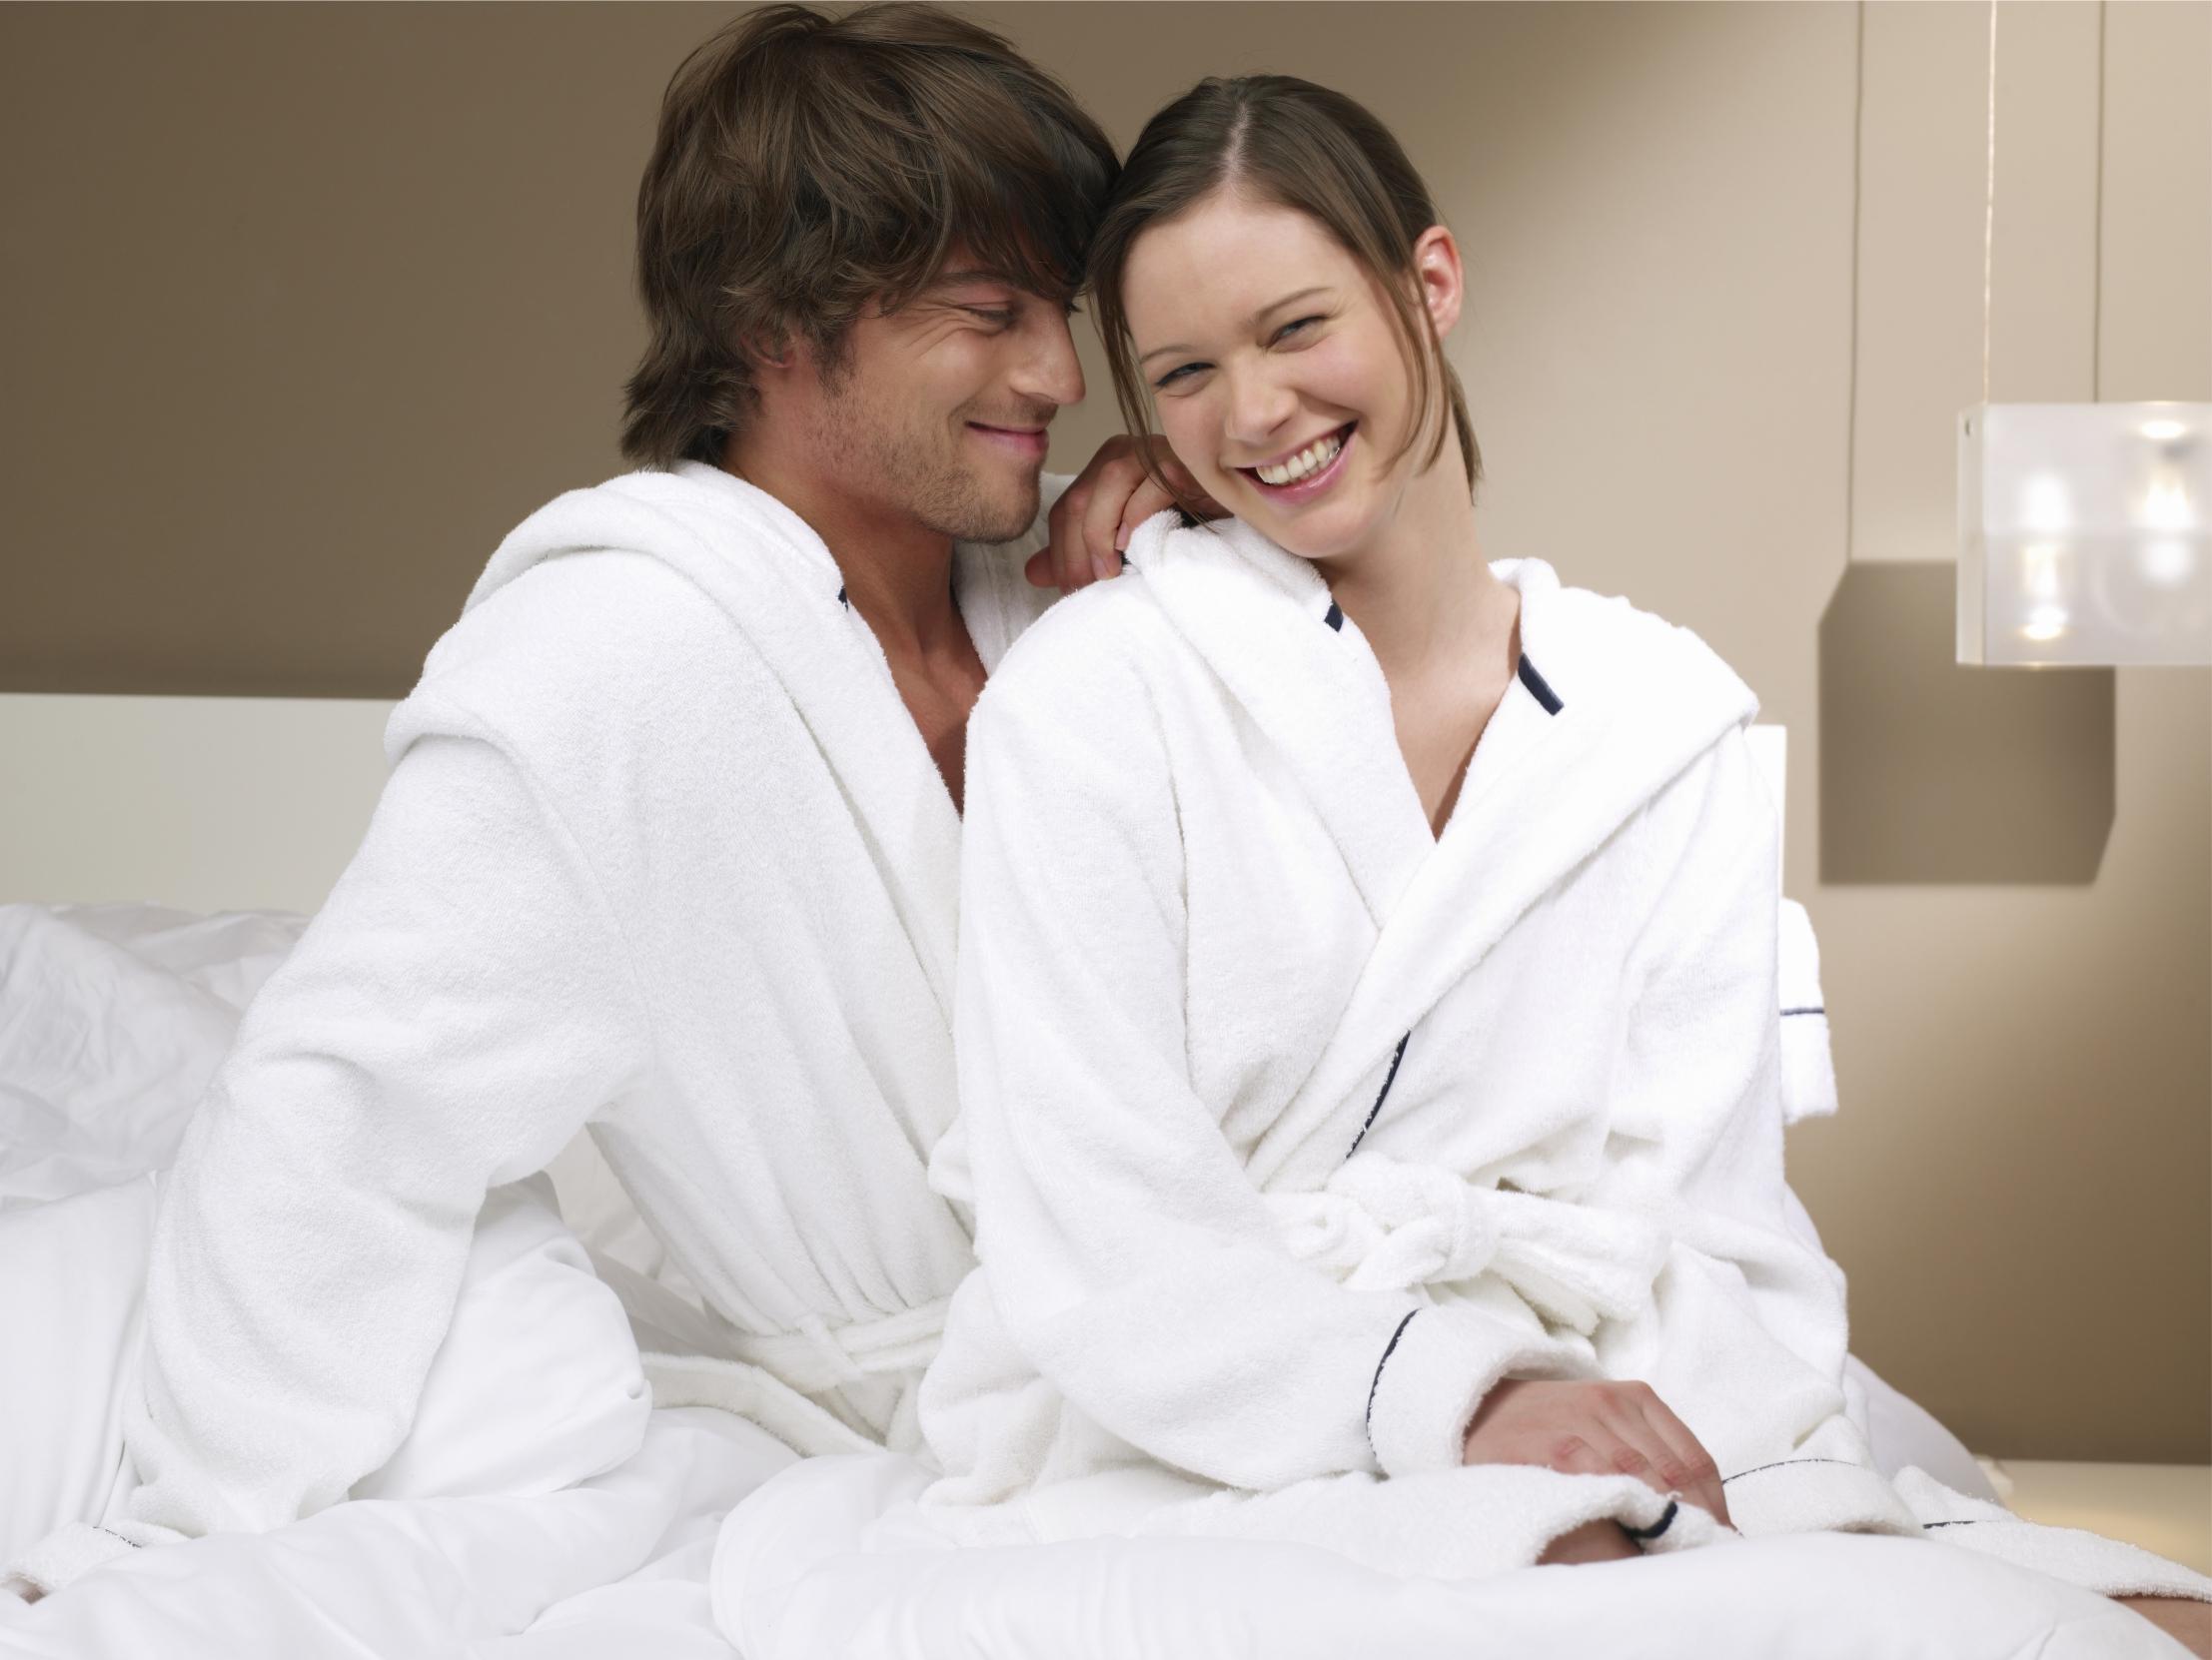 Hotel bathrobes by Kingly.